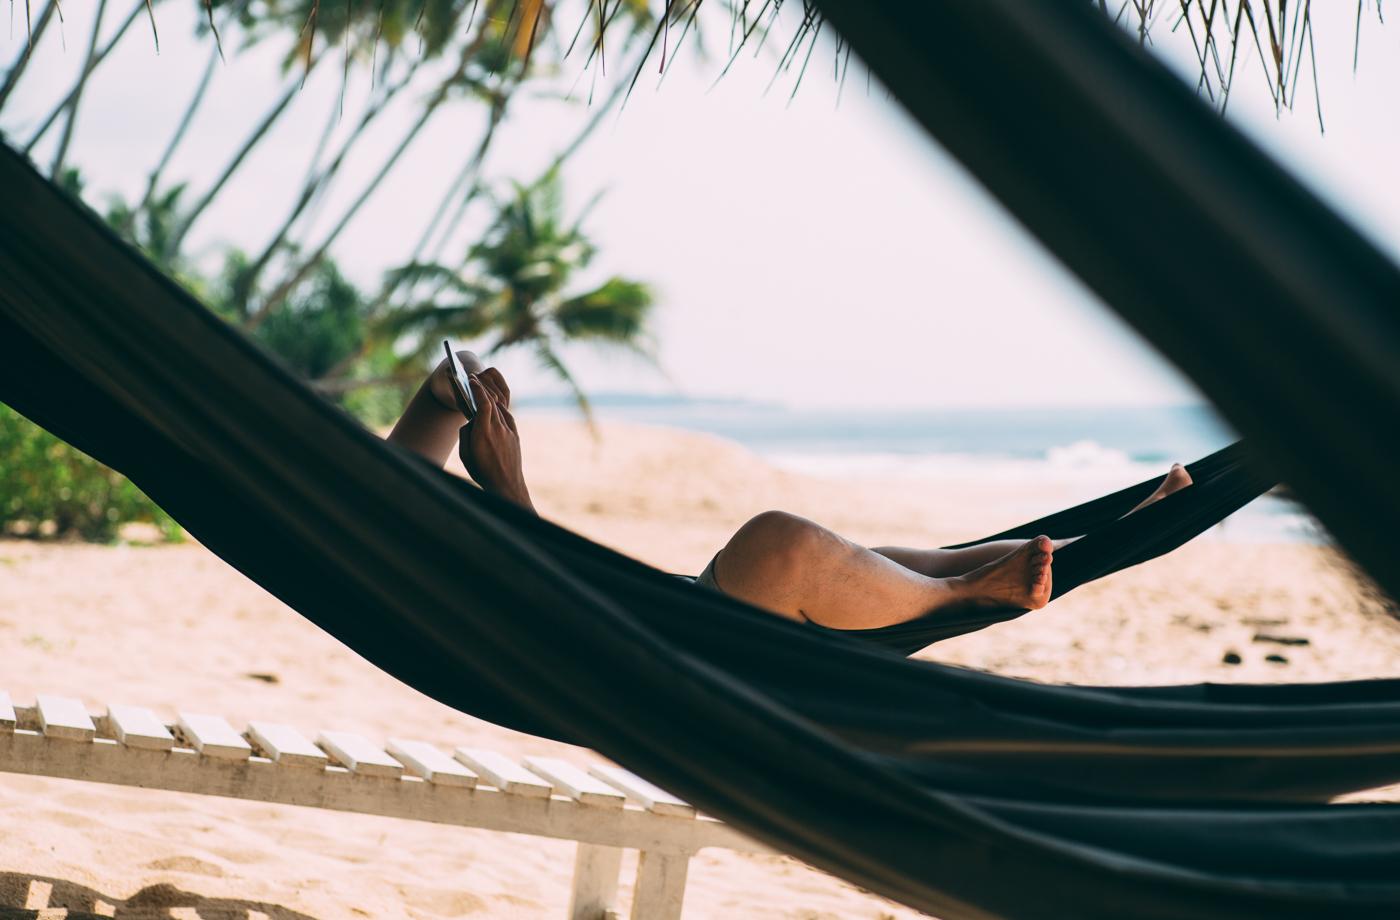 Chilling beachside